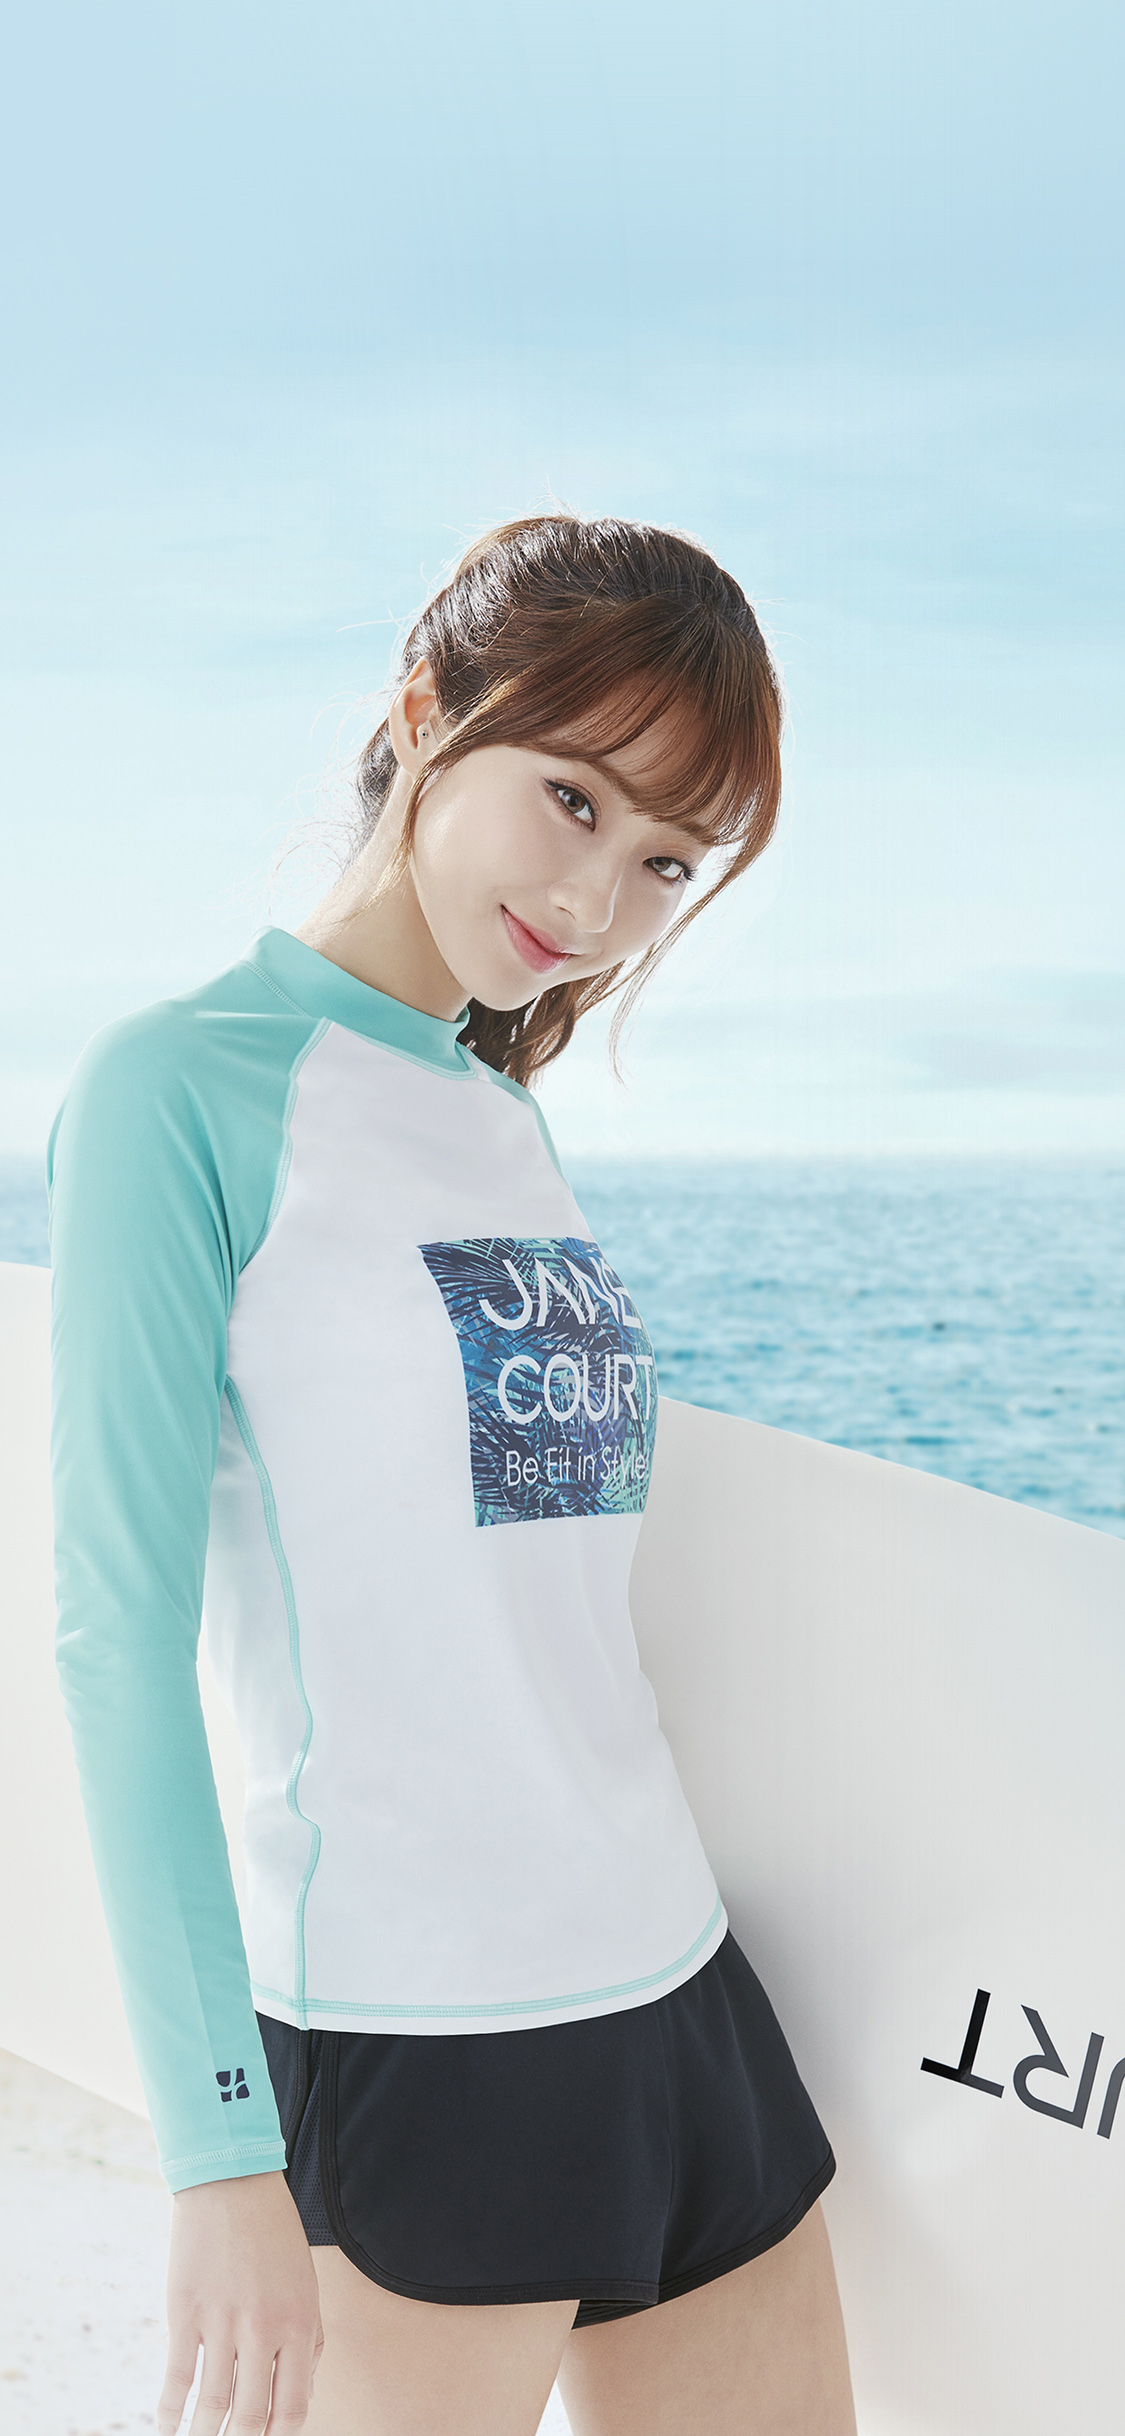 iPhoneXpapers.com-Apple-iPhone-wallpaper-hn34-summer-beach-beauty-sea-girl